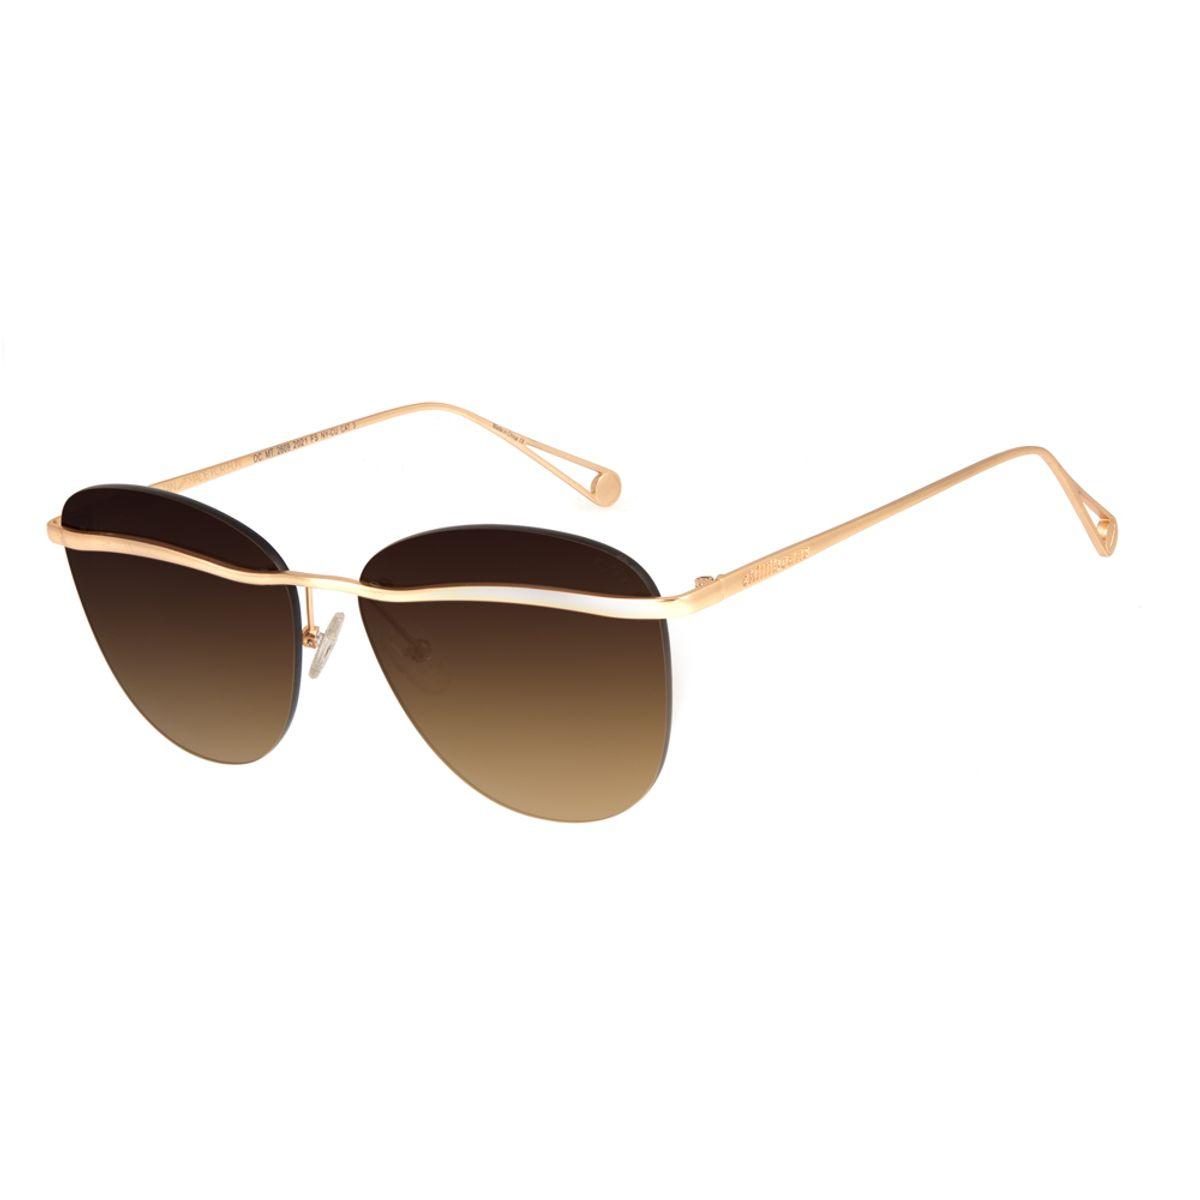 58f15b6b9 Óculos de Sol Chilli Beans Feminino Metal Máxi Lente Flutuante ...